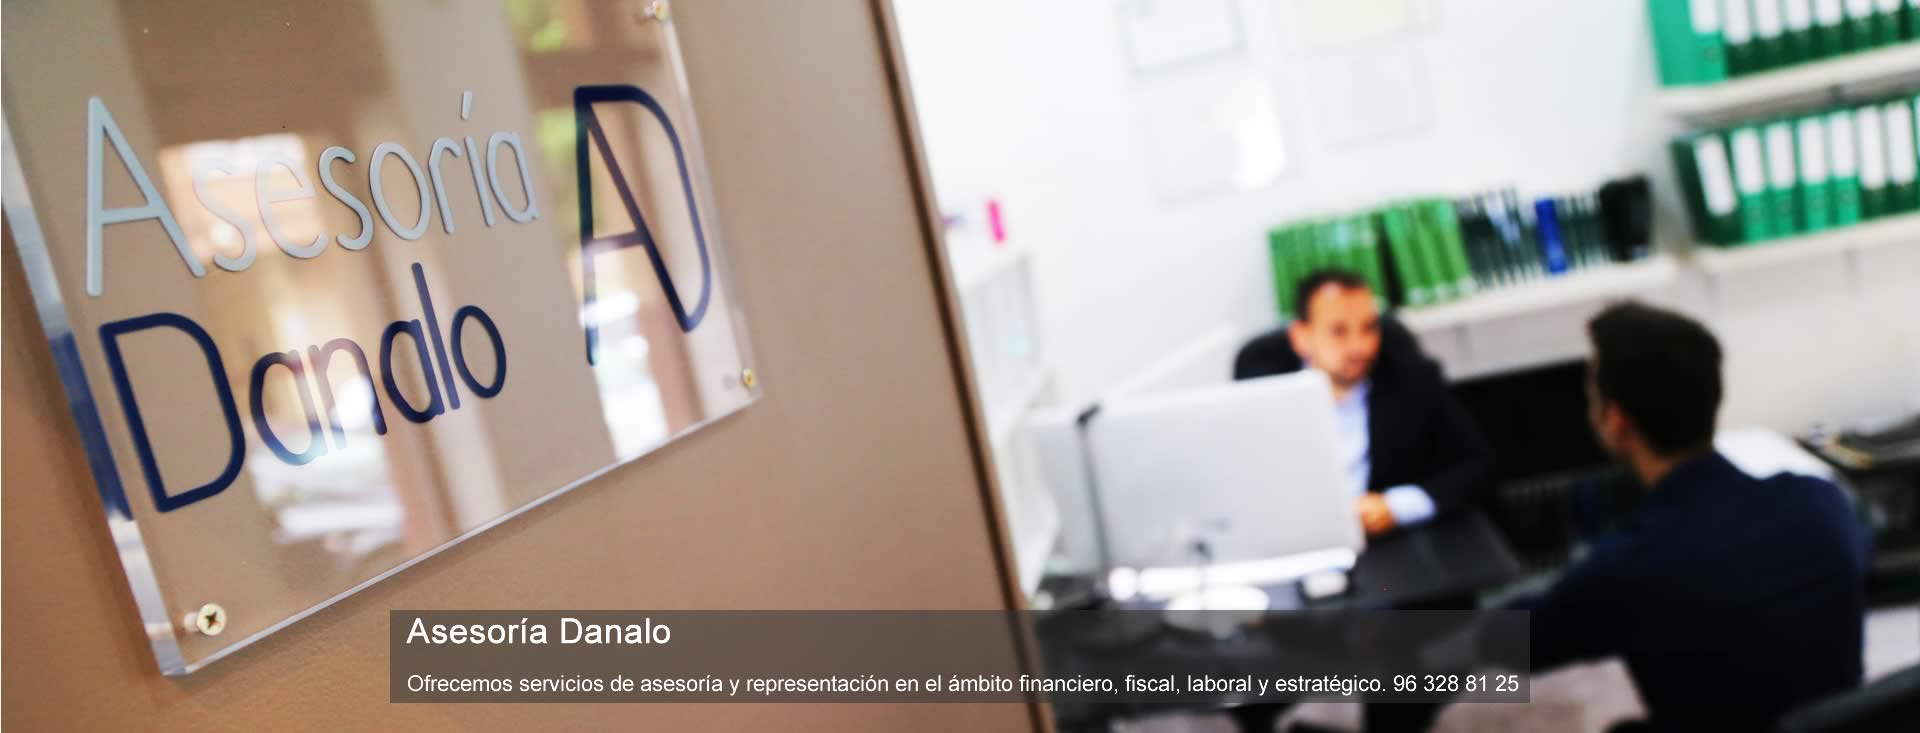 Asesoria Danalo